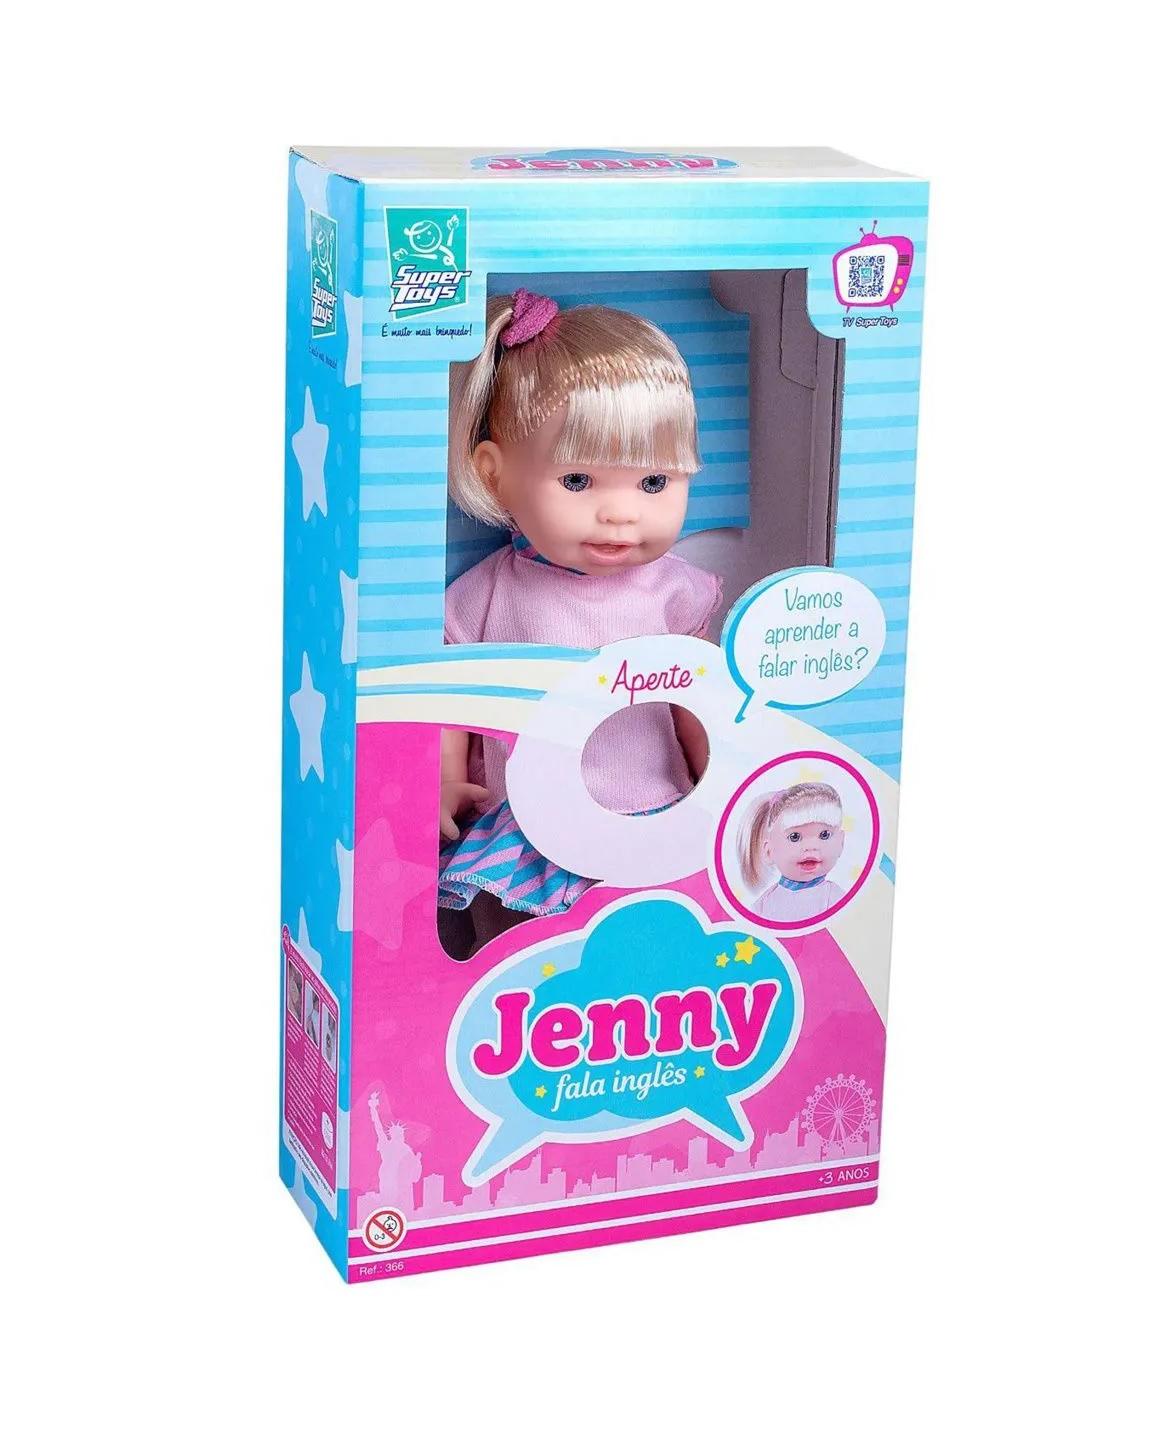 Boneca Jenny Fala Inglês com Cabelo - Super Toys